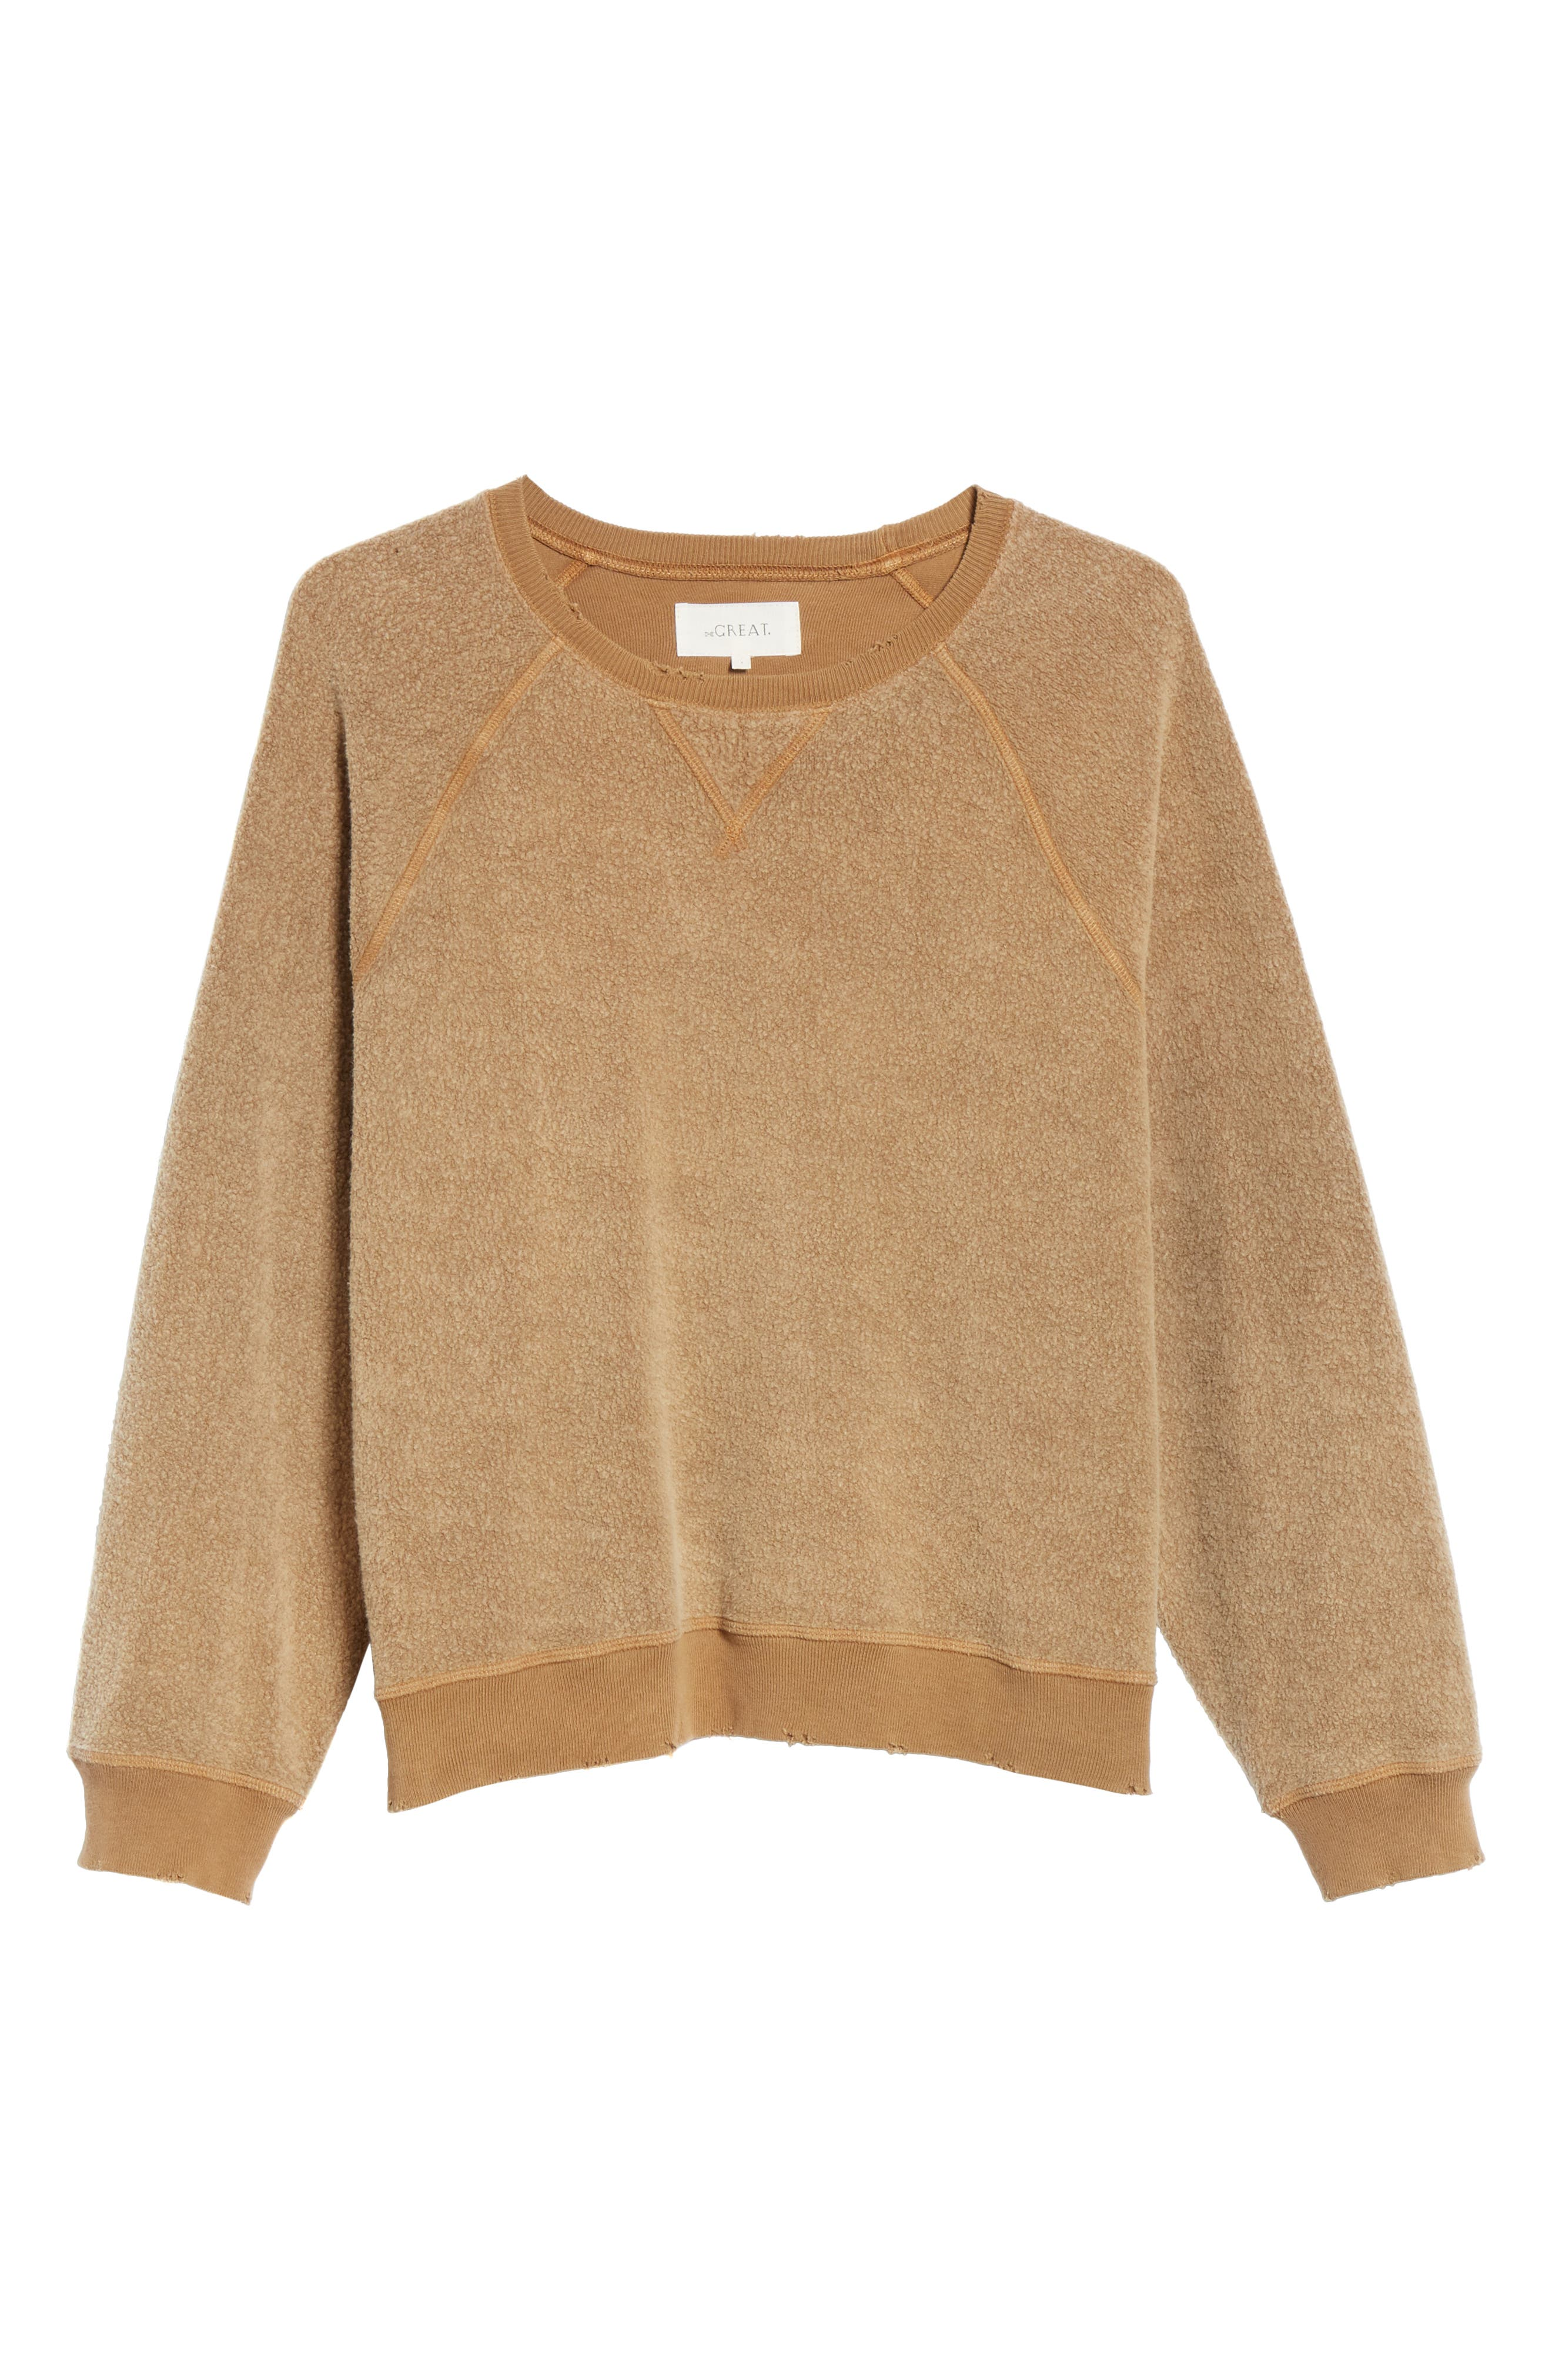 Slouch Sweatshirt,                             Alternate thumbnail 6, color,                             CAMEL